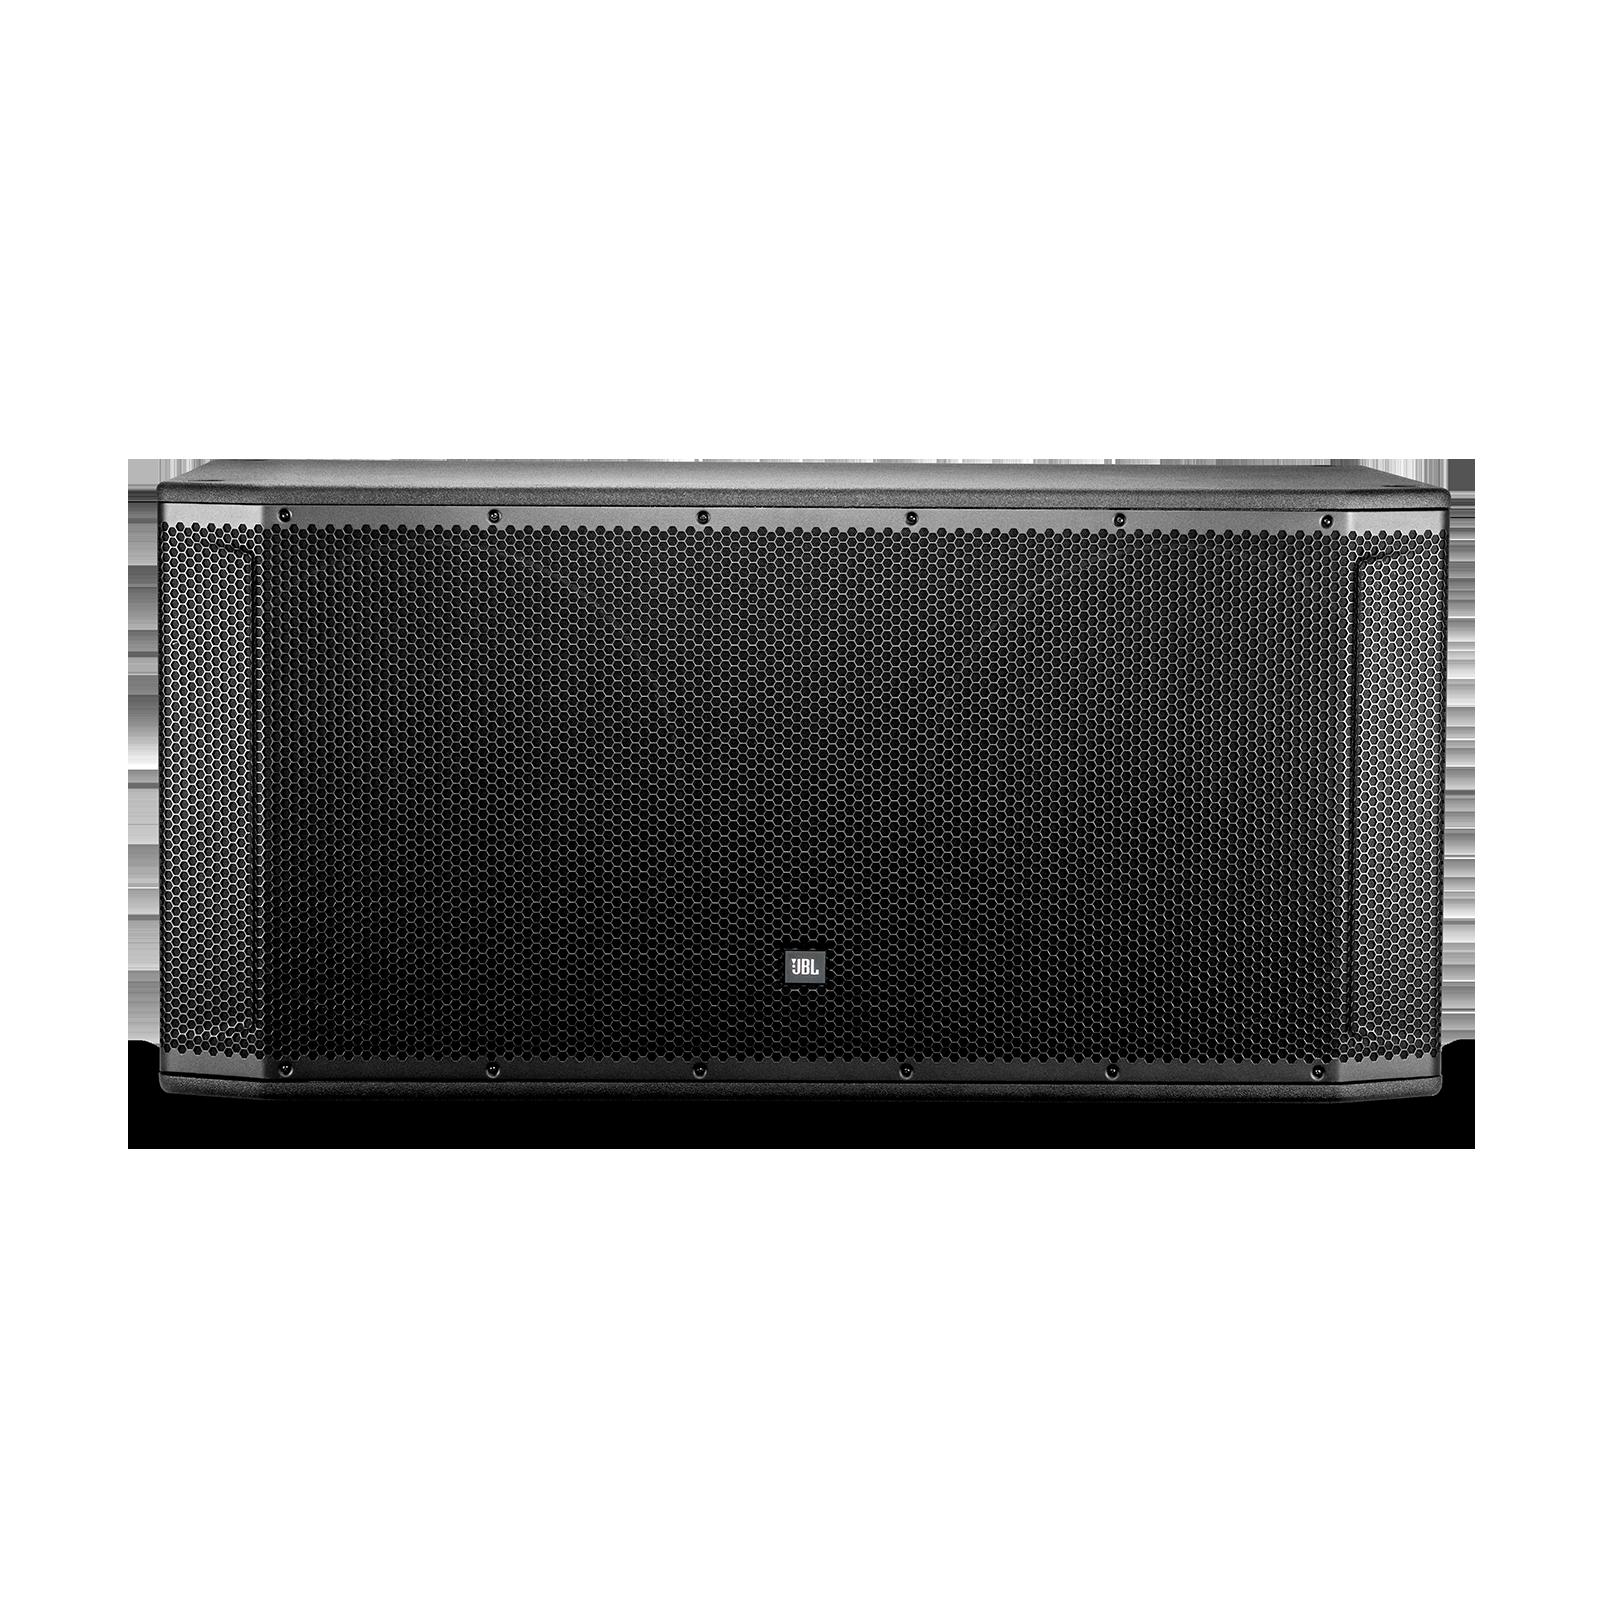 "JBL SRX828S - Black - 18"" Dual Passive Subwoofer System - Front"